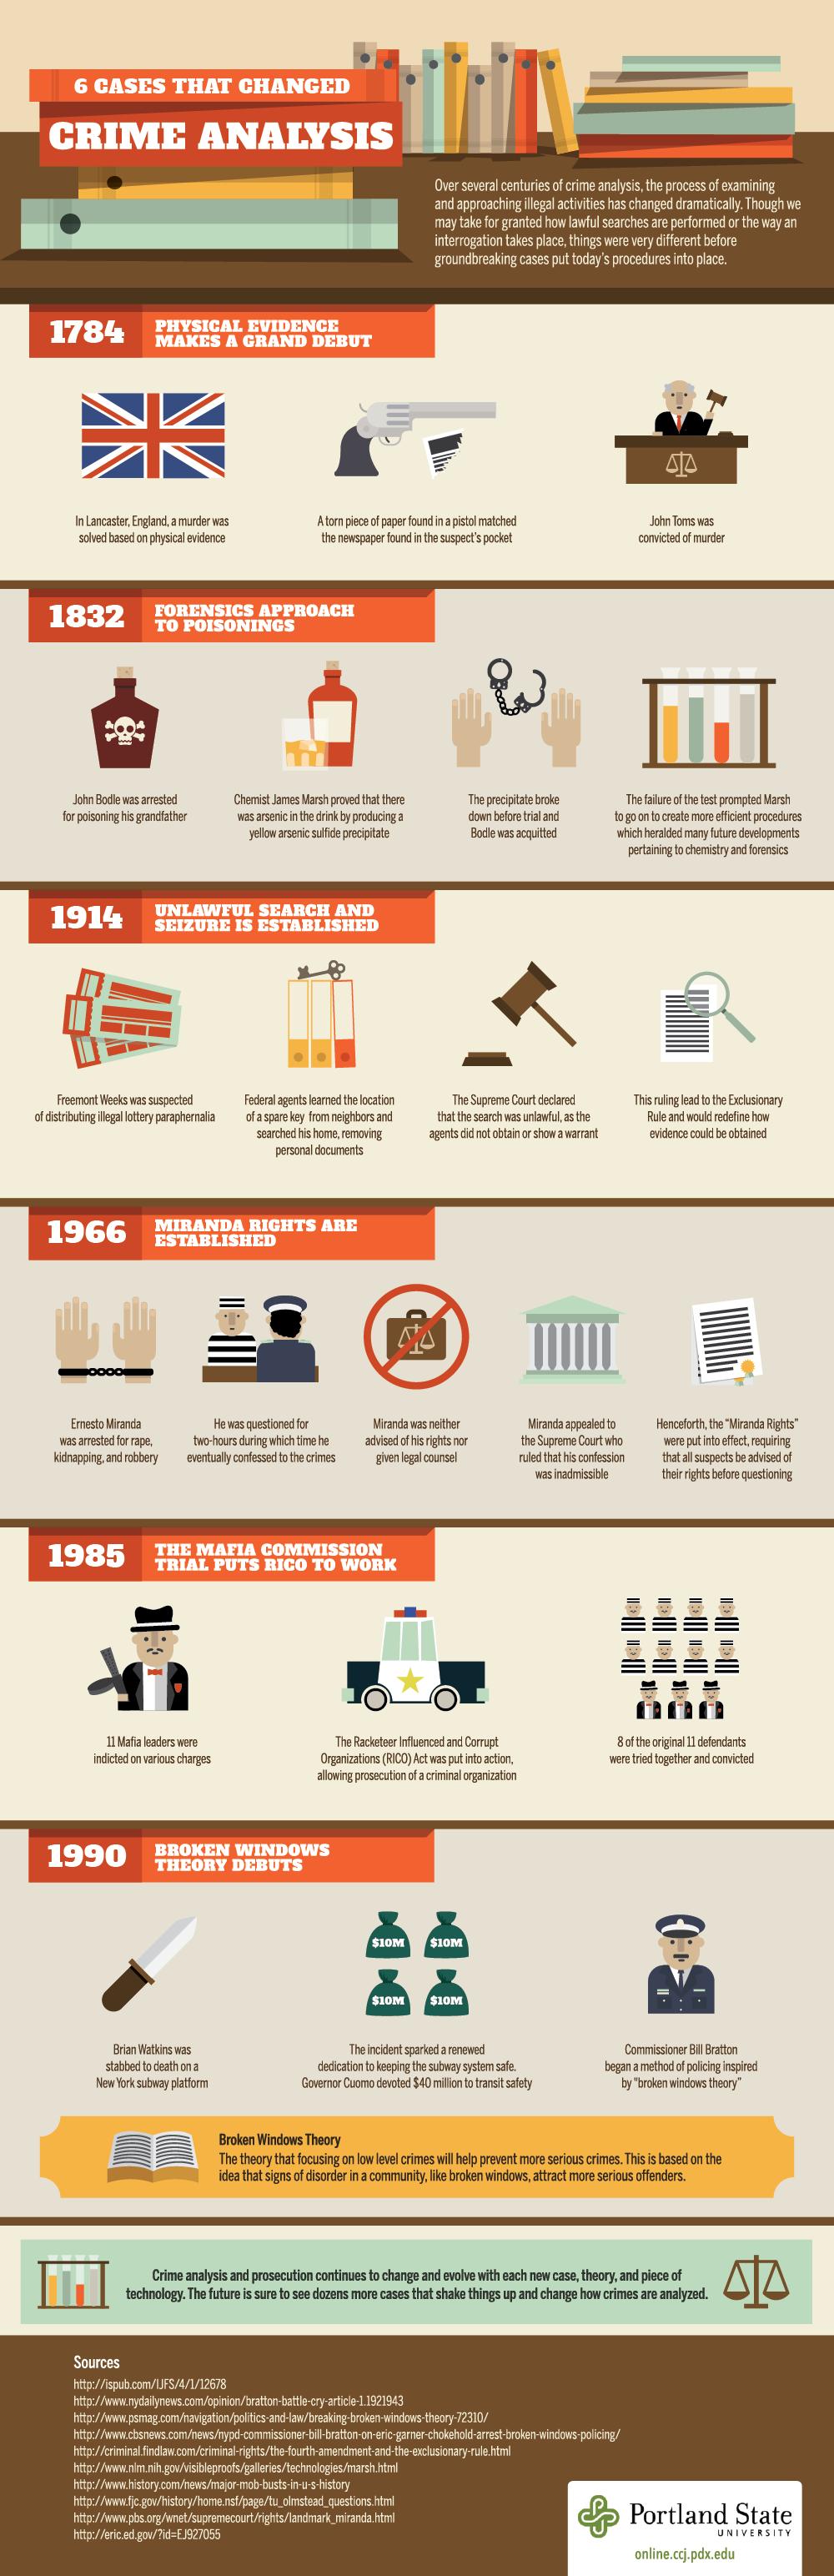 crime analysis infographic